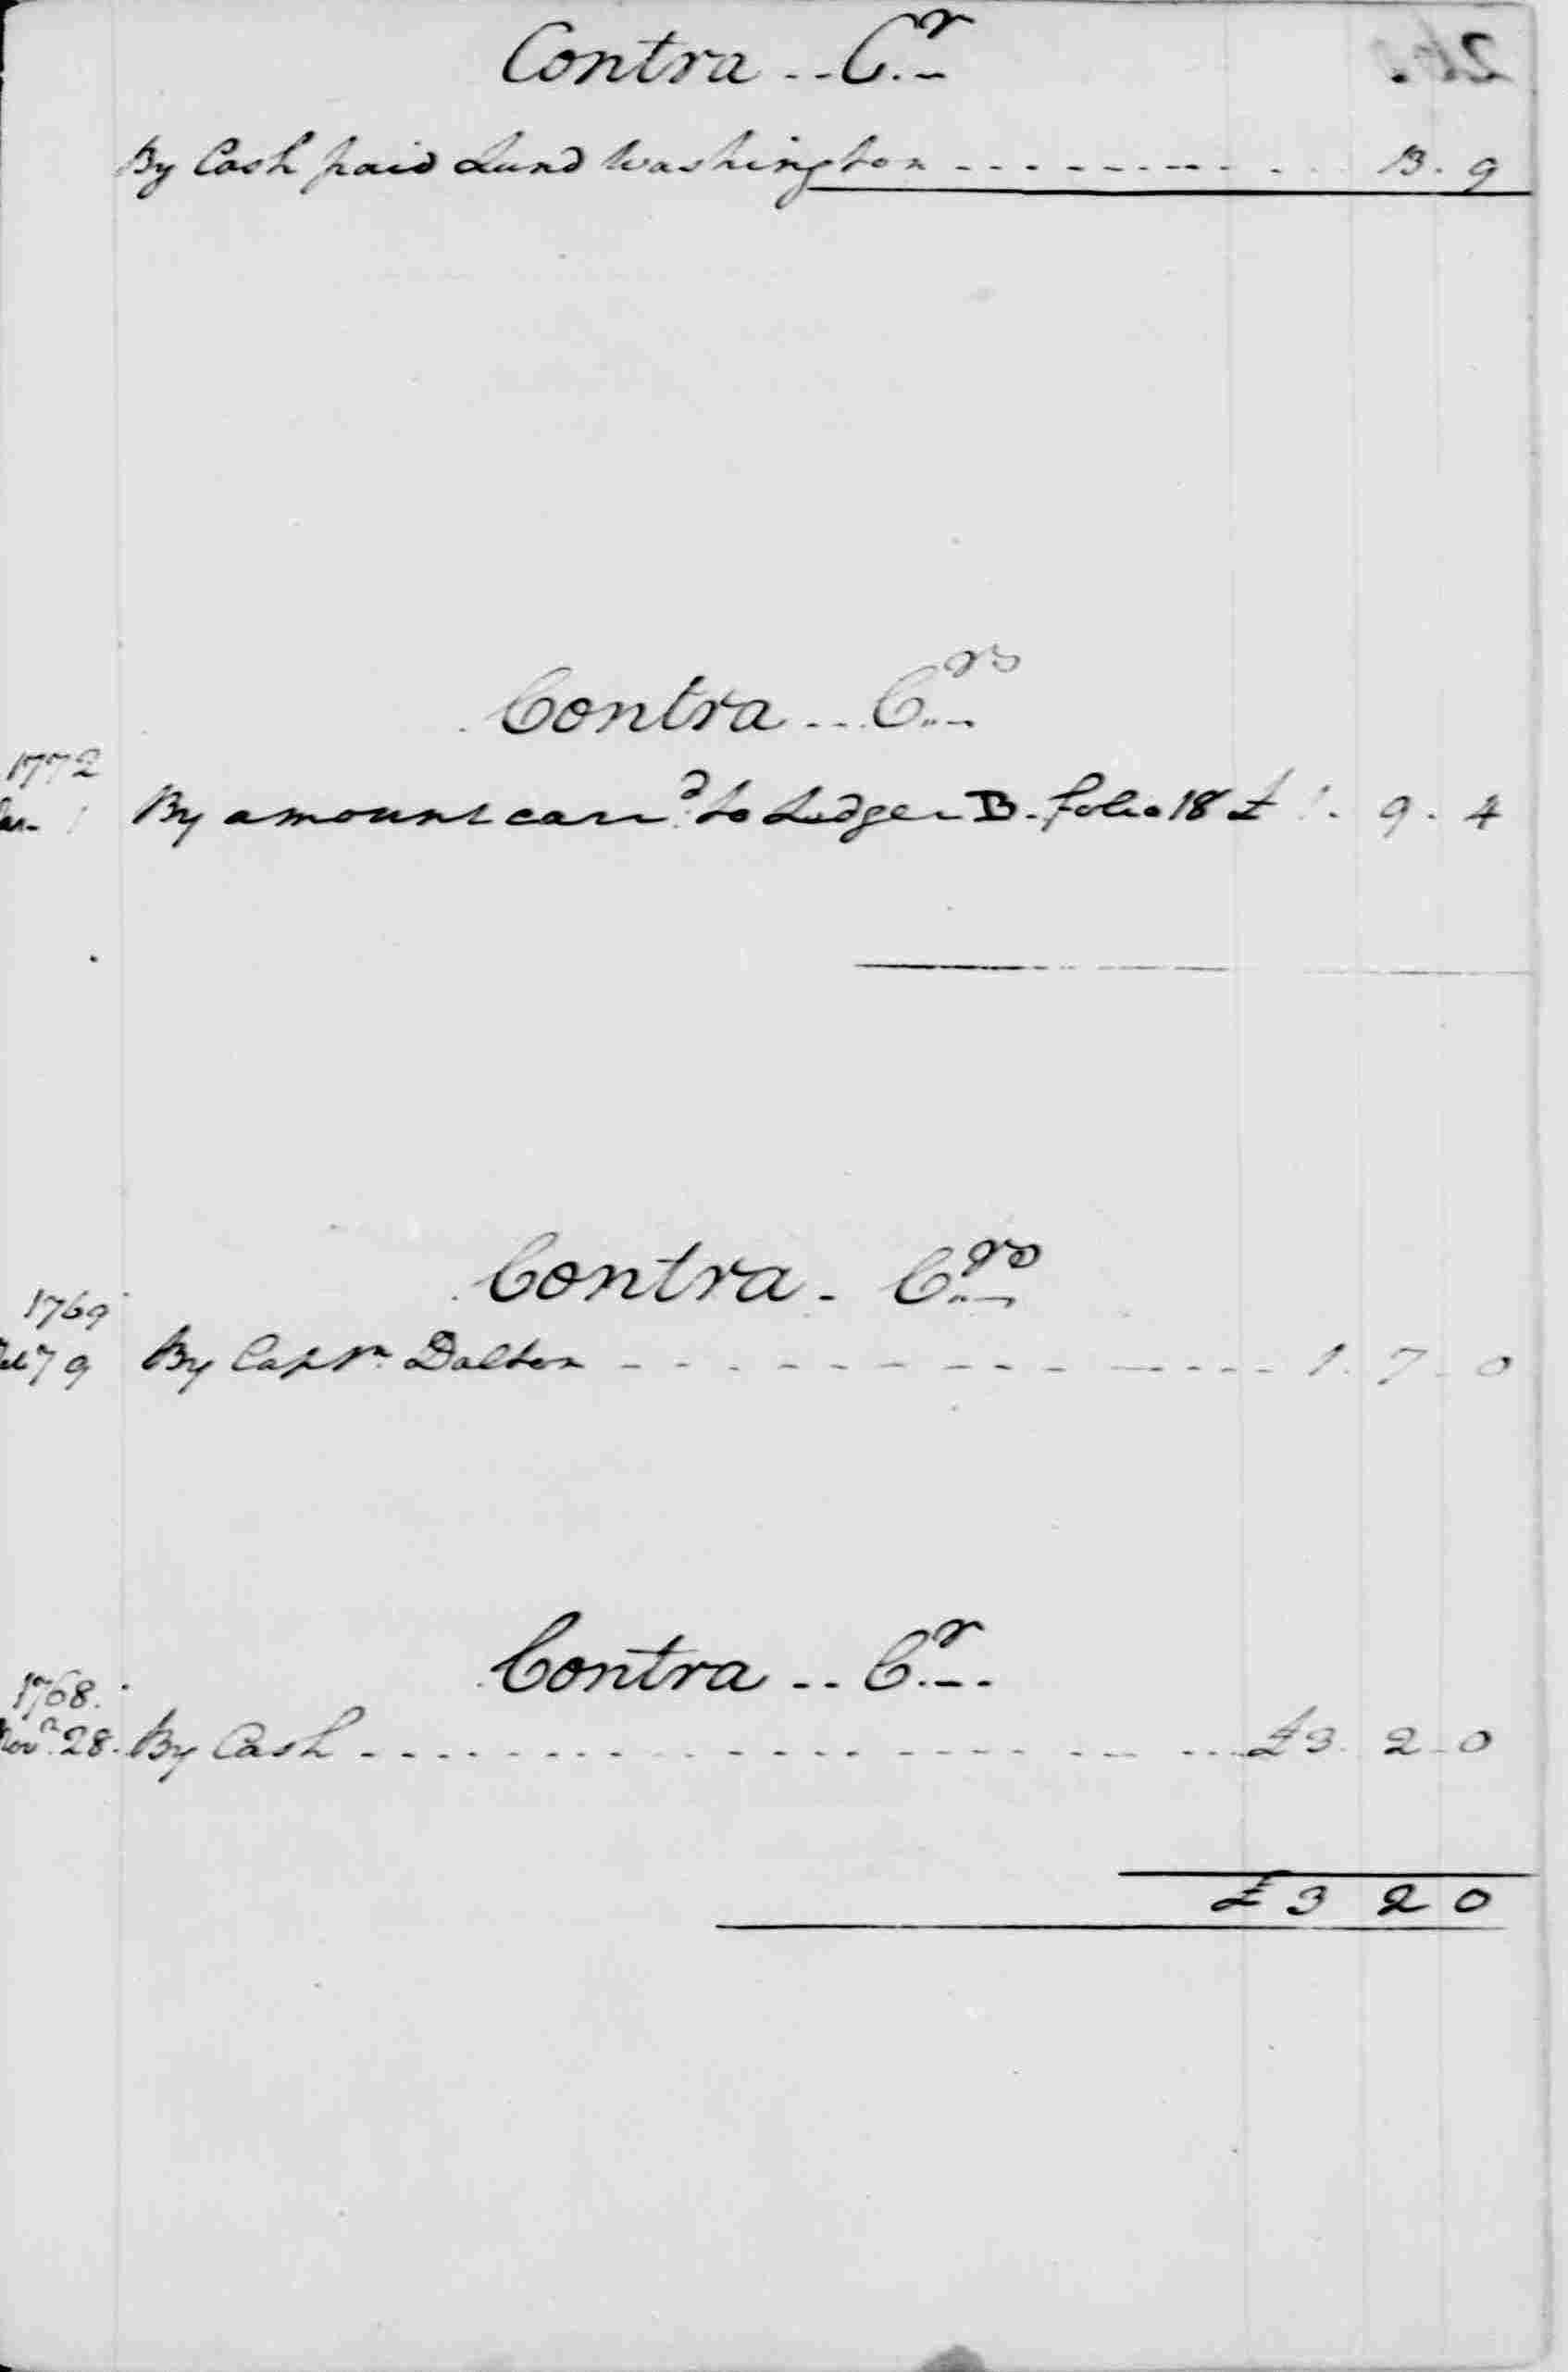 Ledger A, folio 260, right side